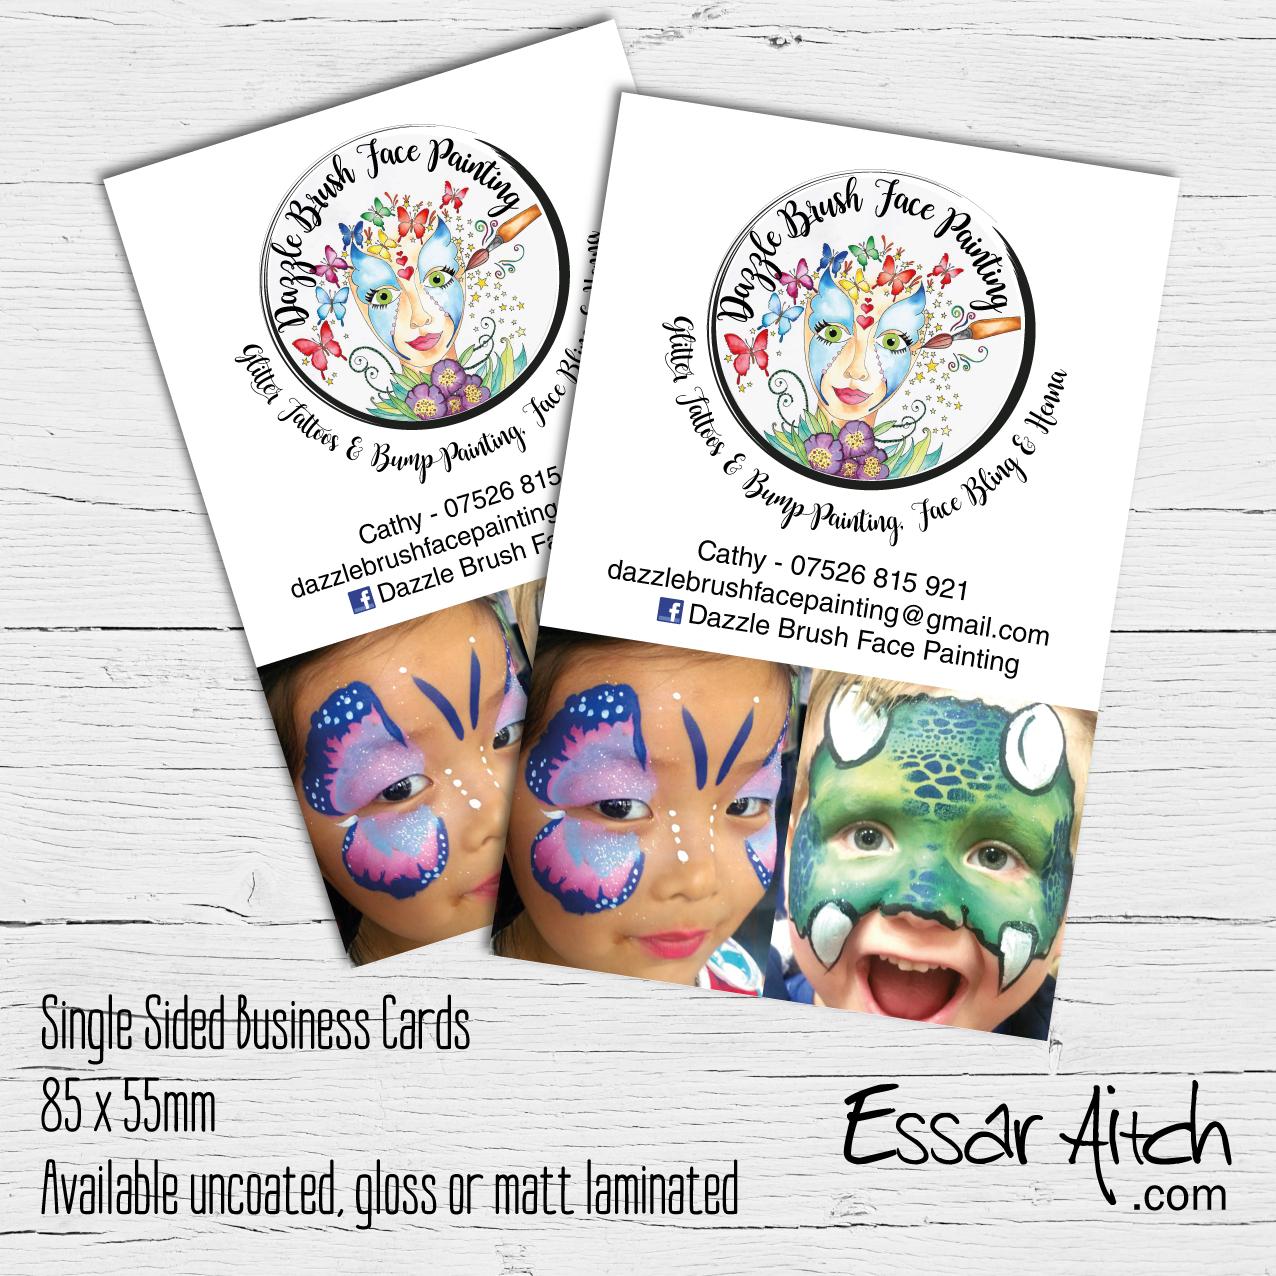 Single Sided Business Cards – Essar Aitch